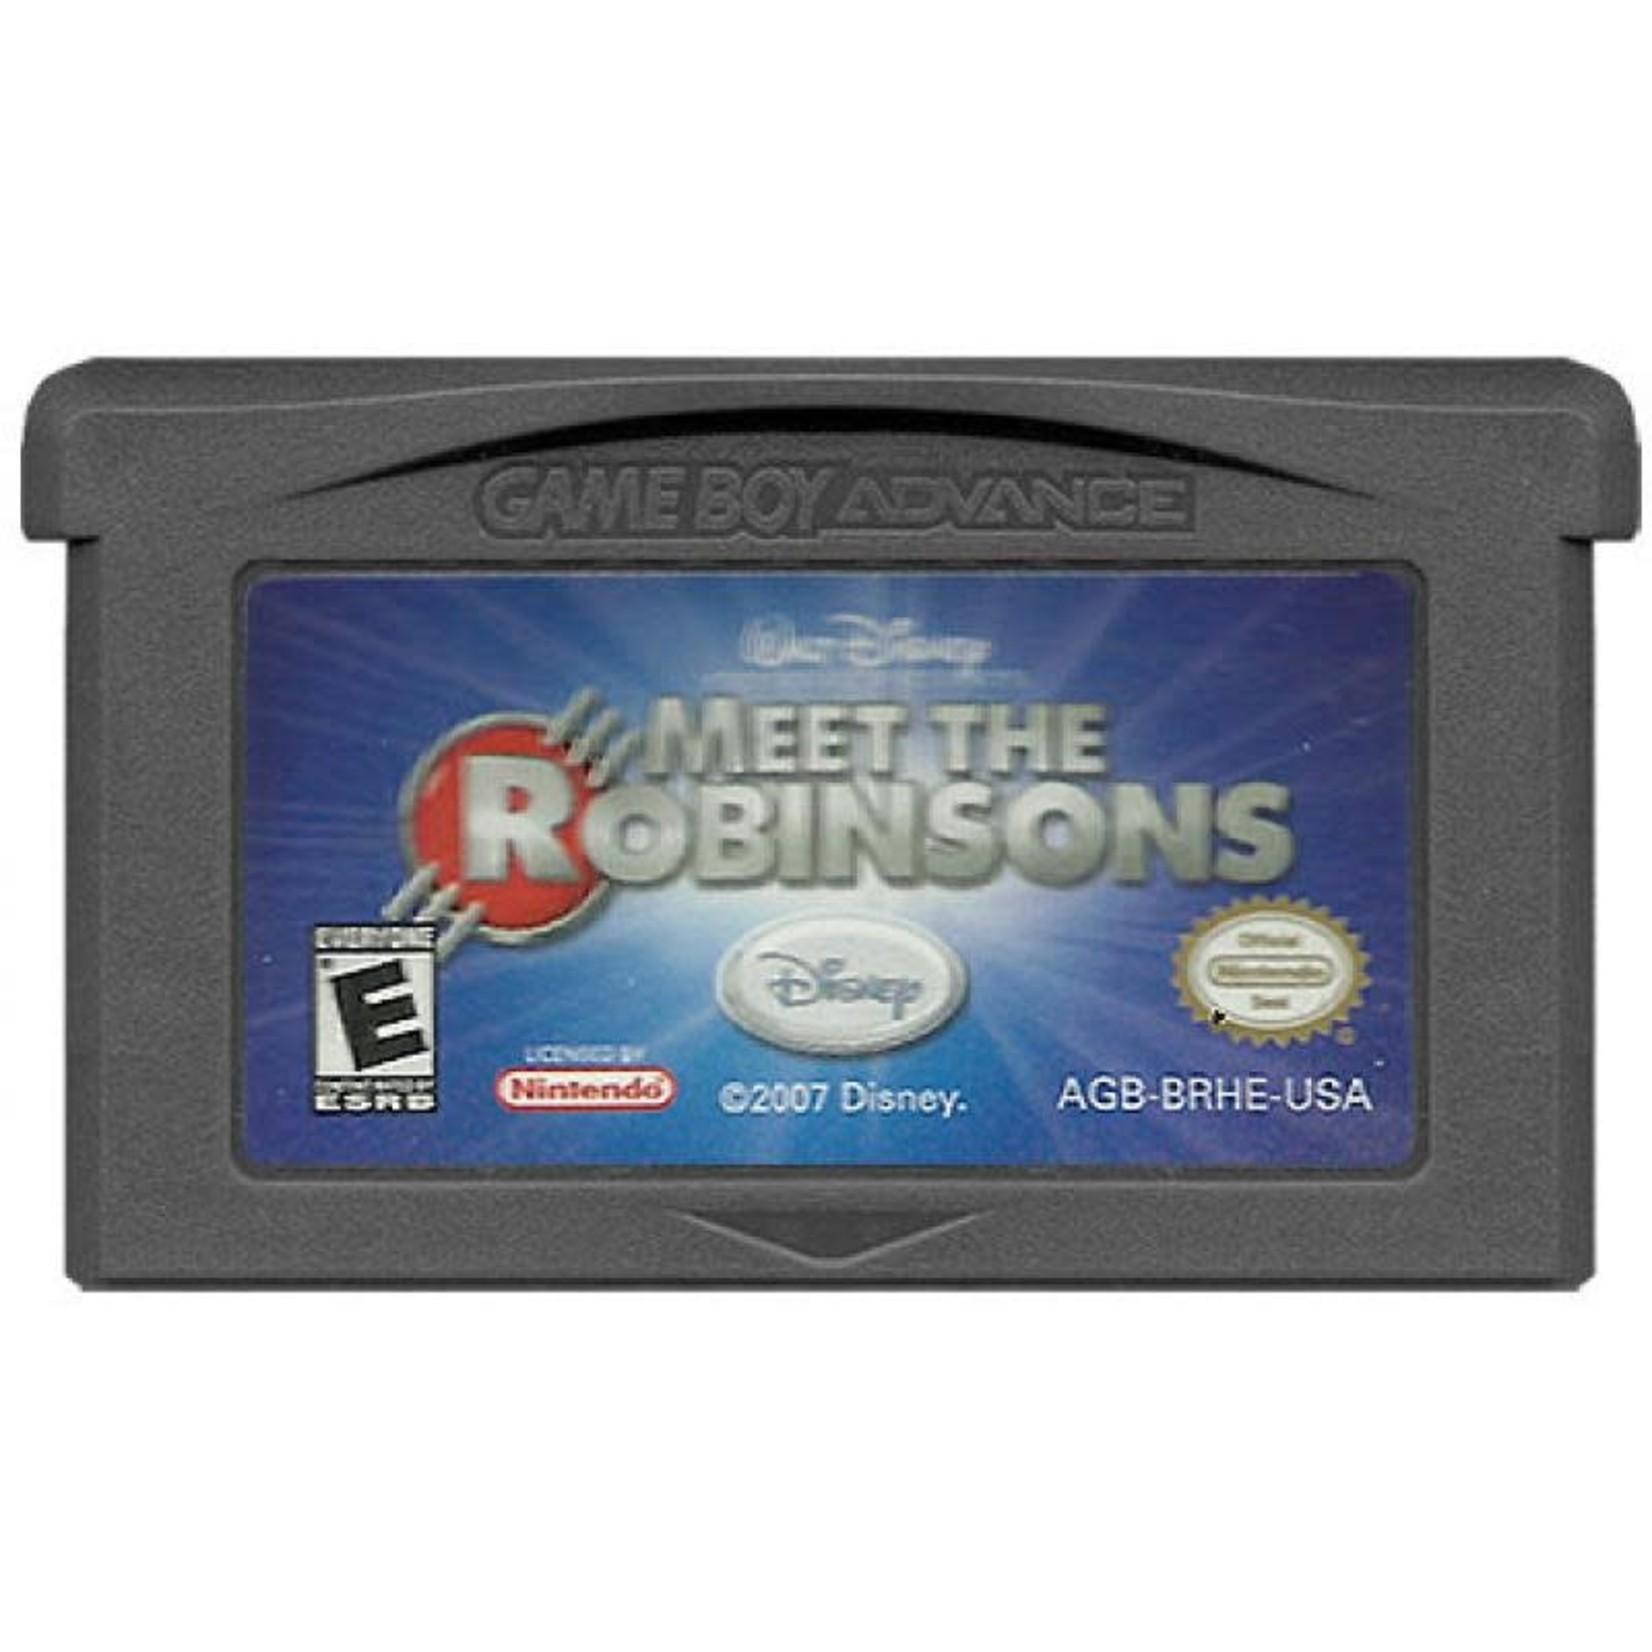 gbau-Meet the Robinsons